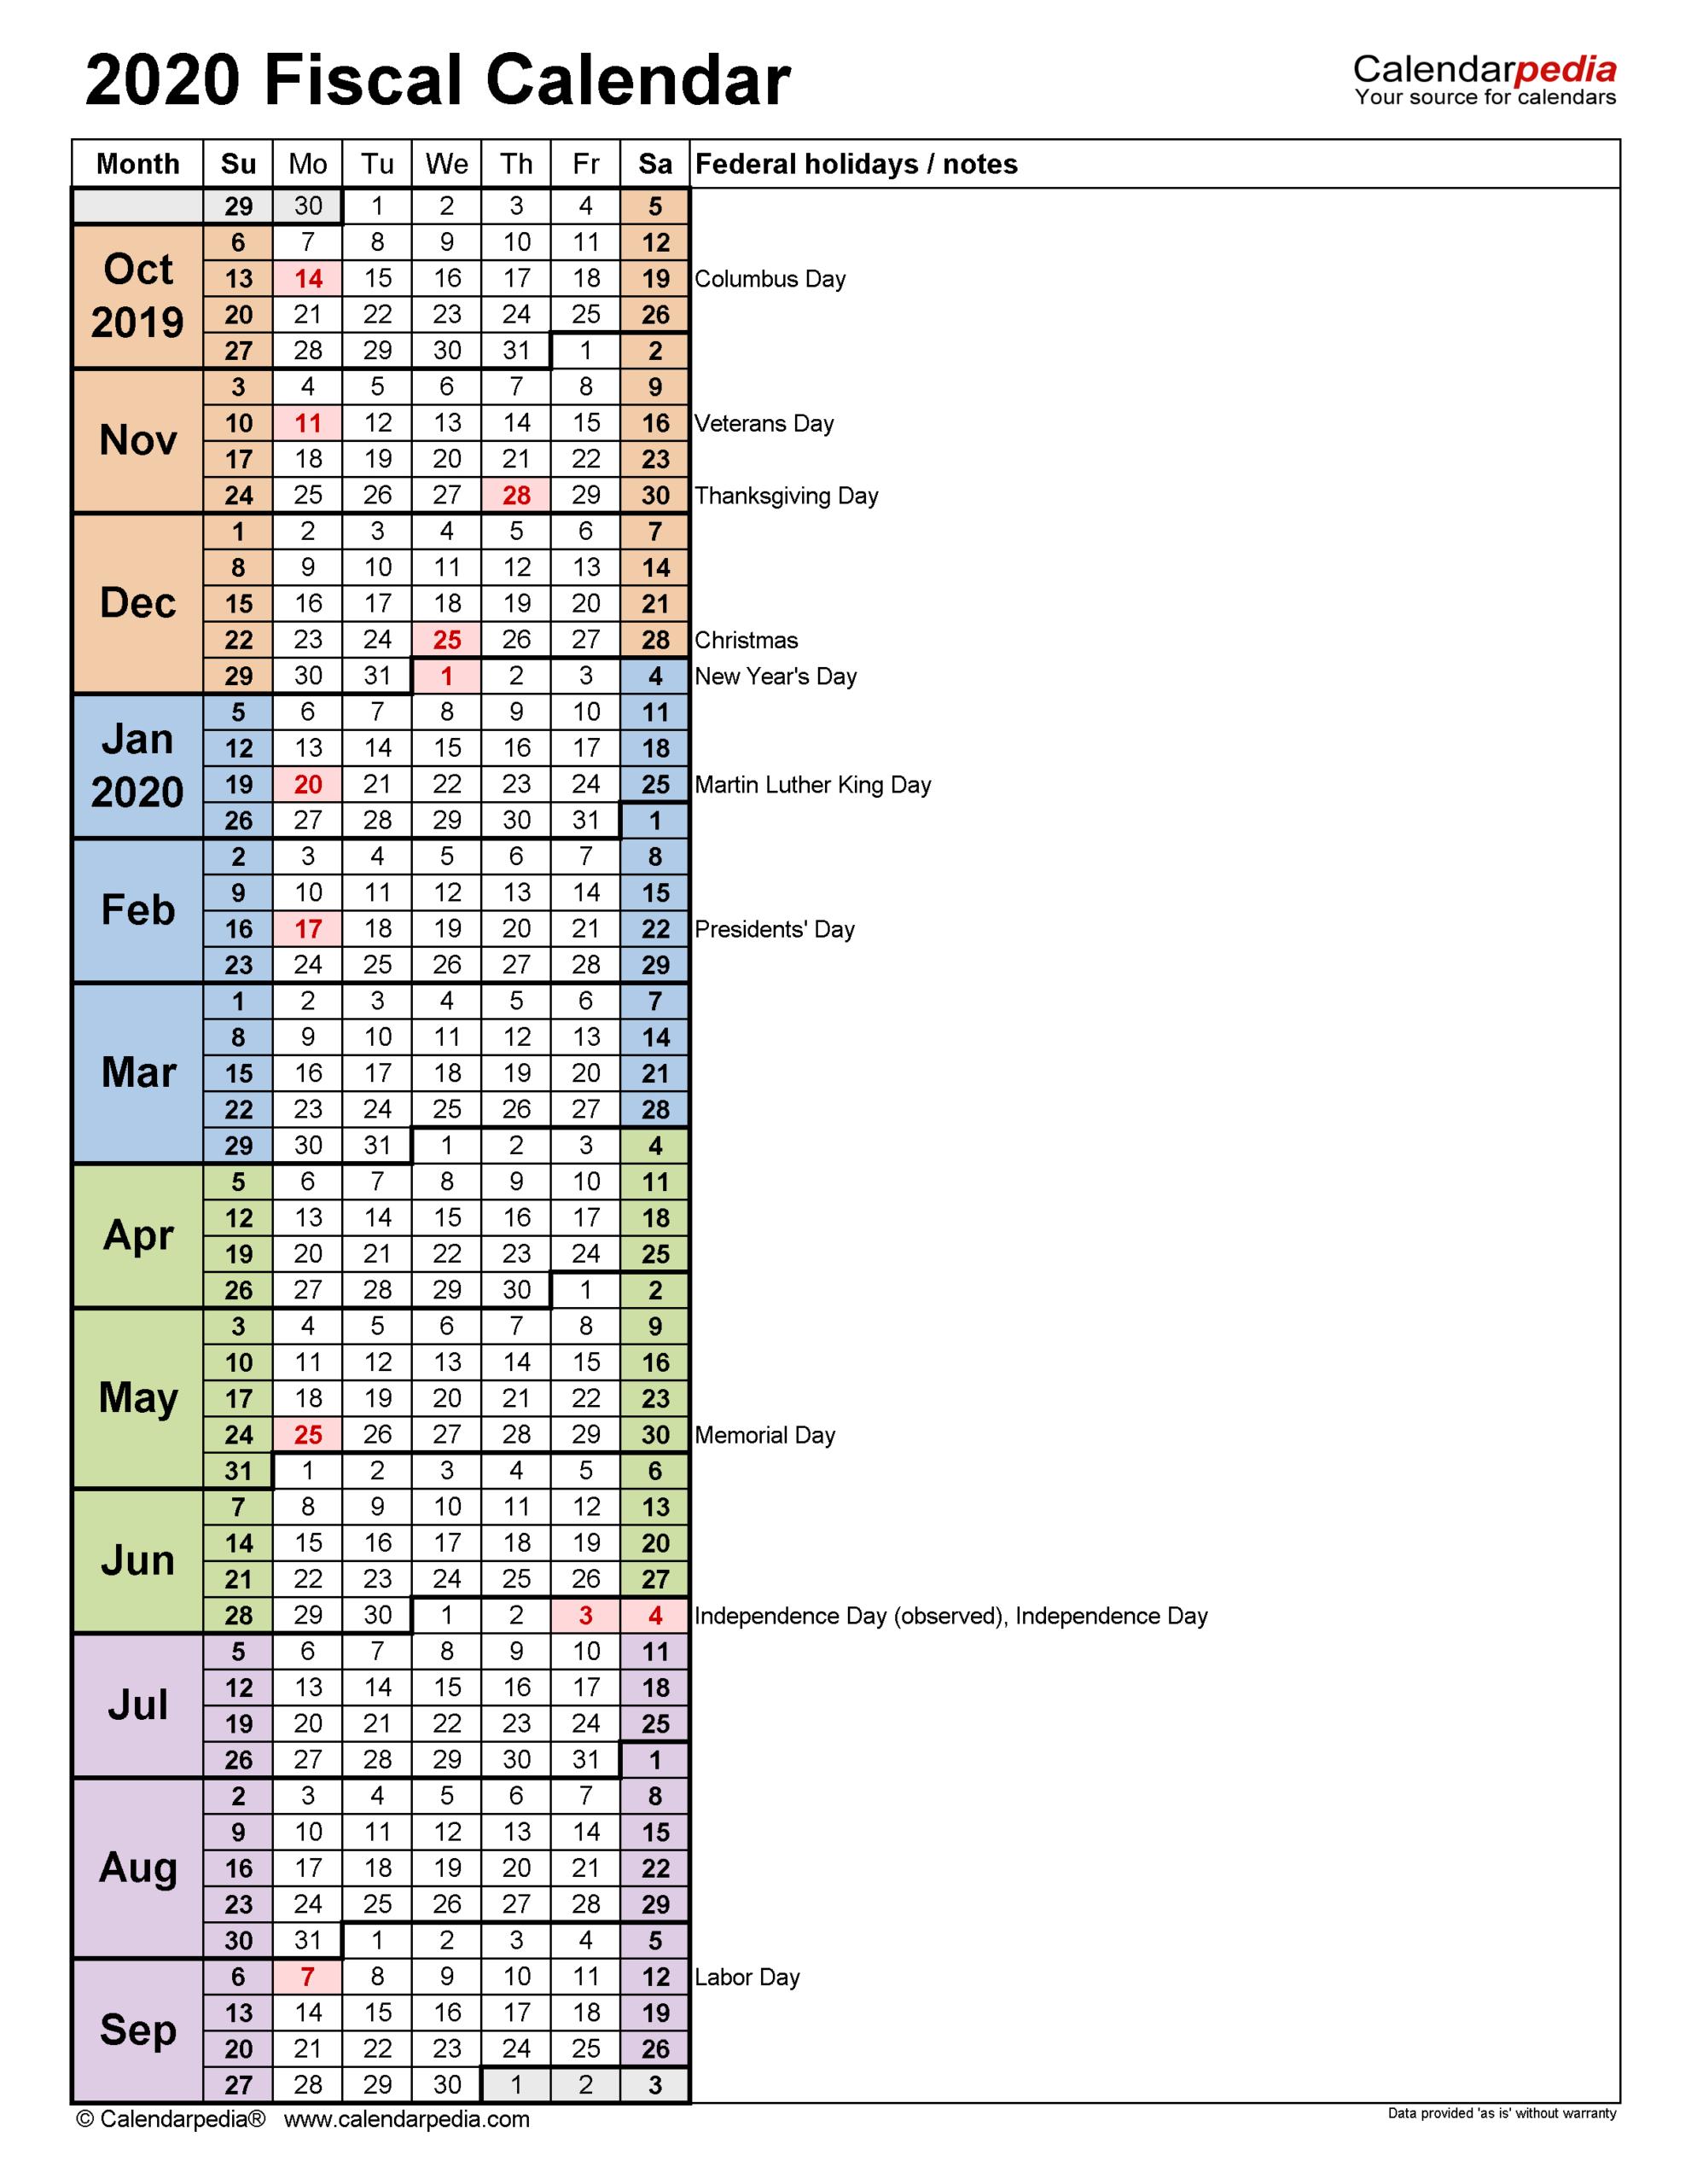 Cisco Fiscal Year Calendar 2021 | Calendar Page  Financial Year Dates 2021 2021